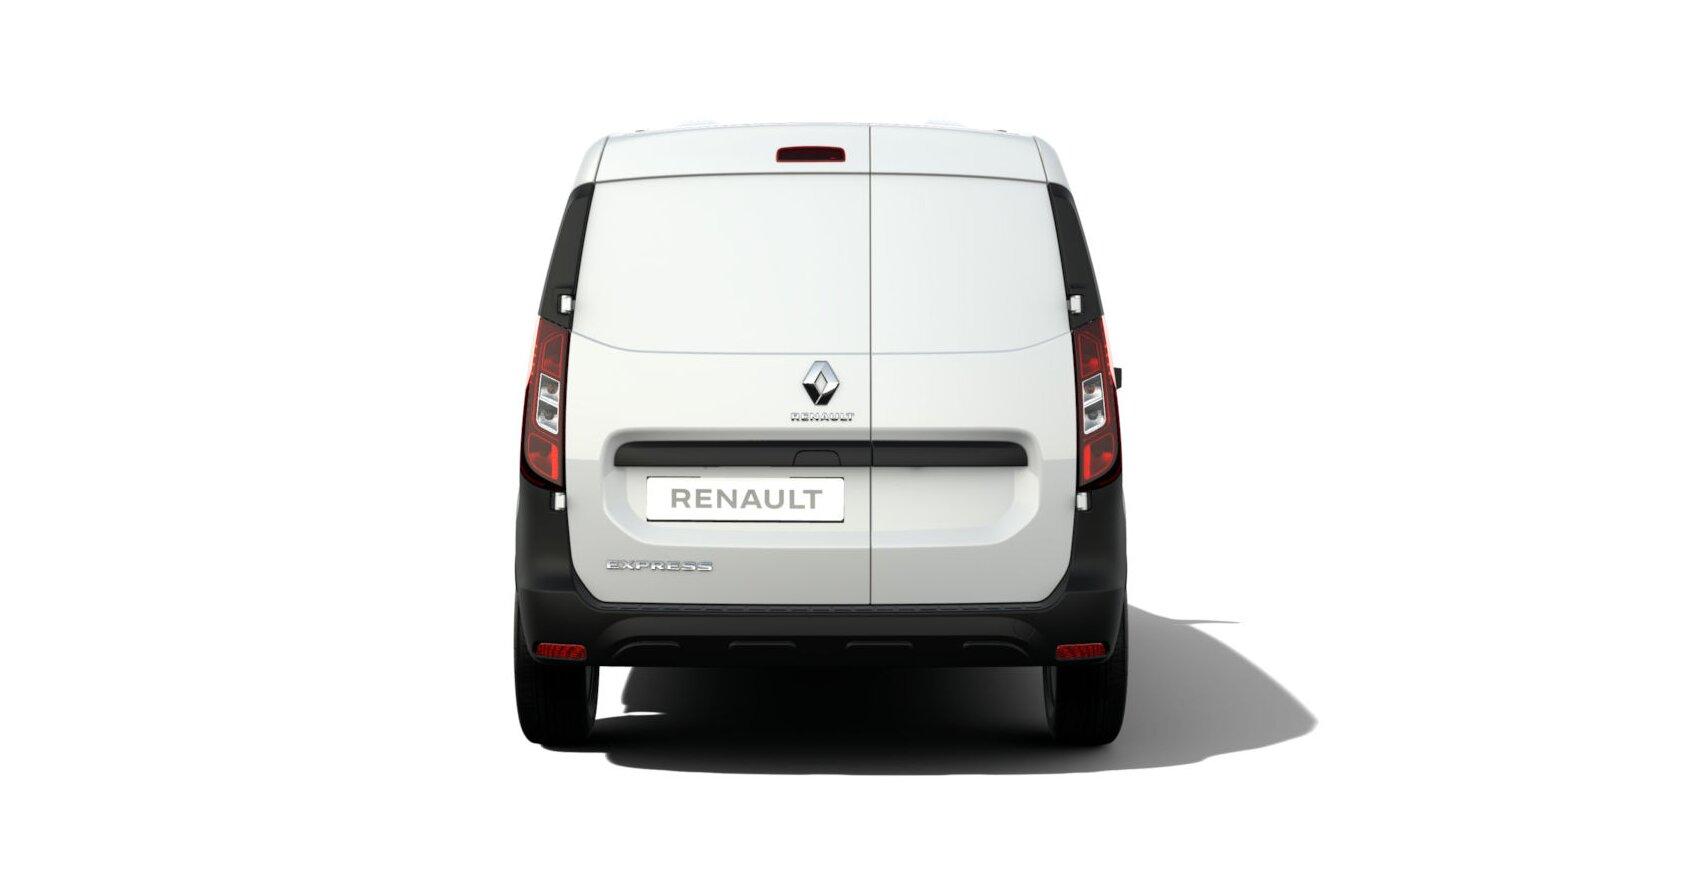 renting Renault Express1.5 Blue dCi Confort